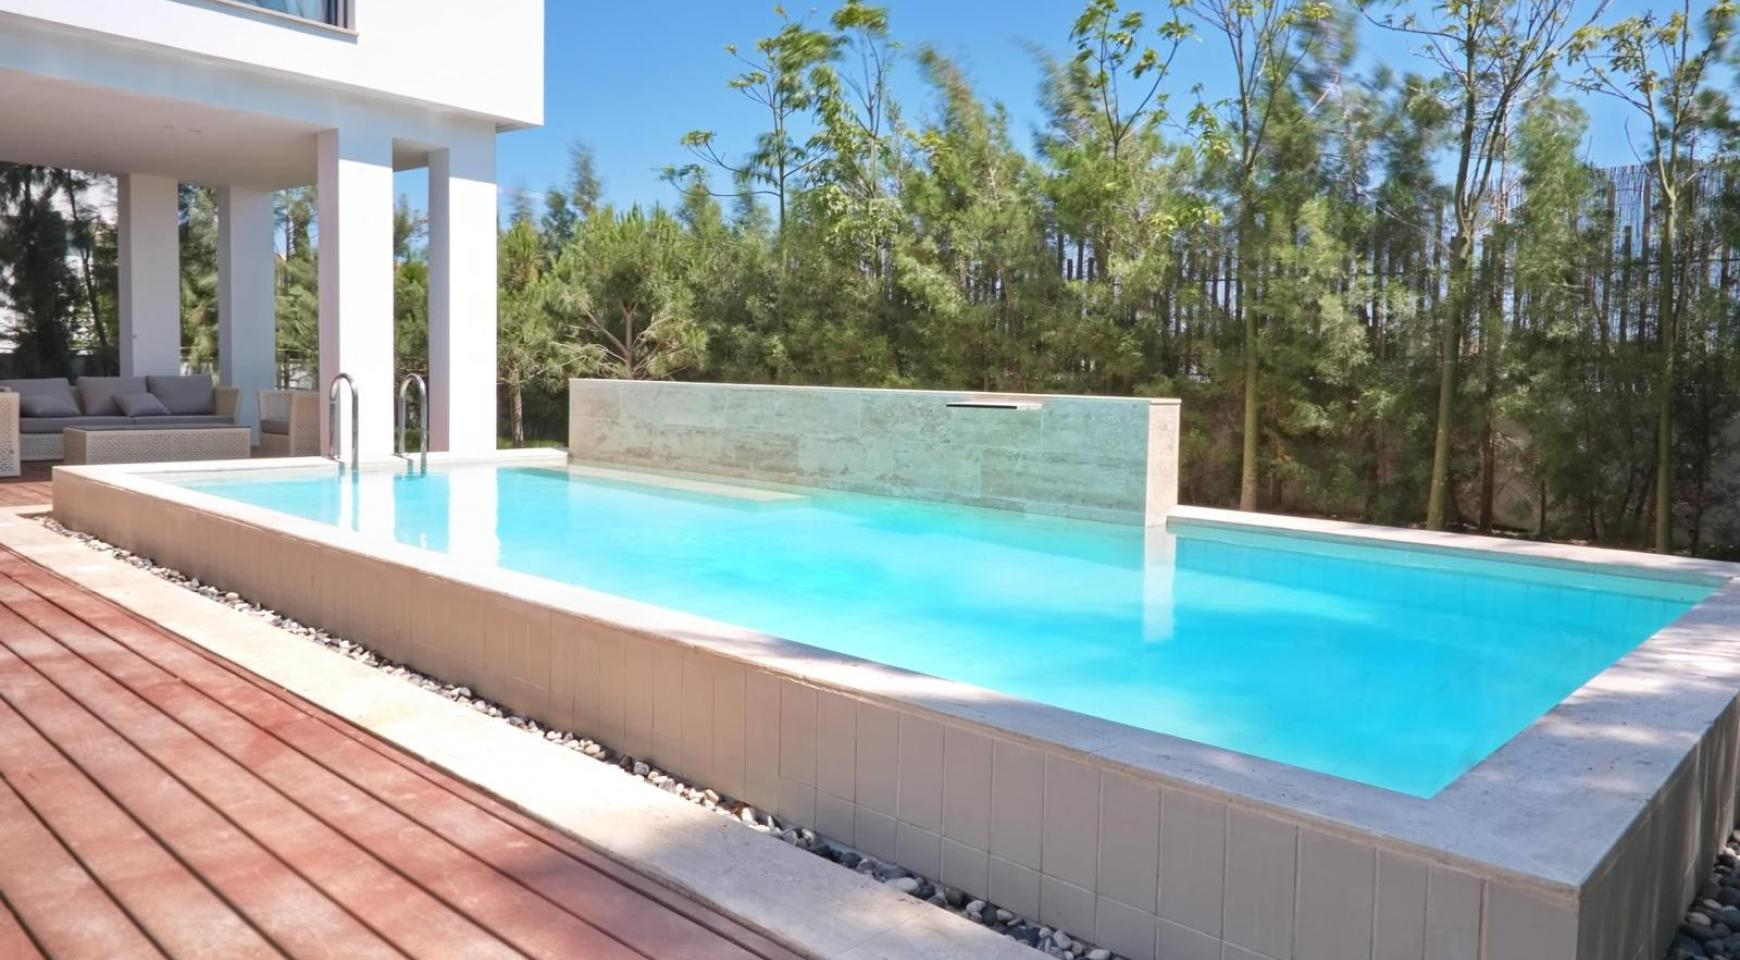 New Luxurious 4 Bedroom Villa in the Tourist Area - 5